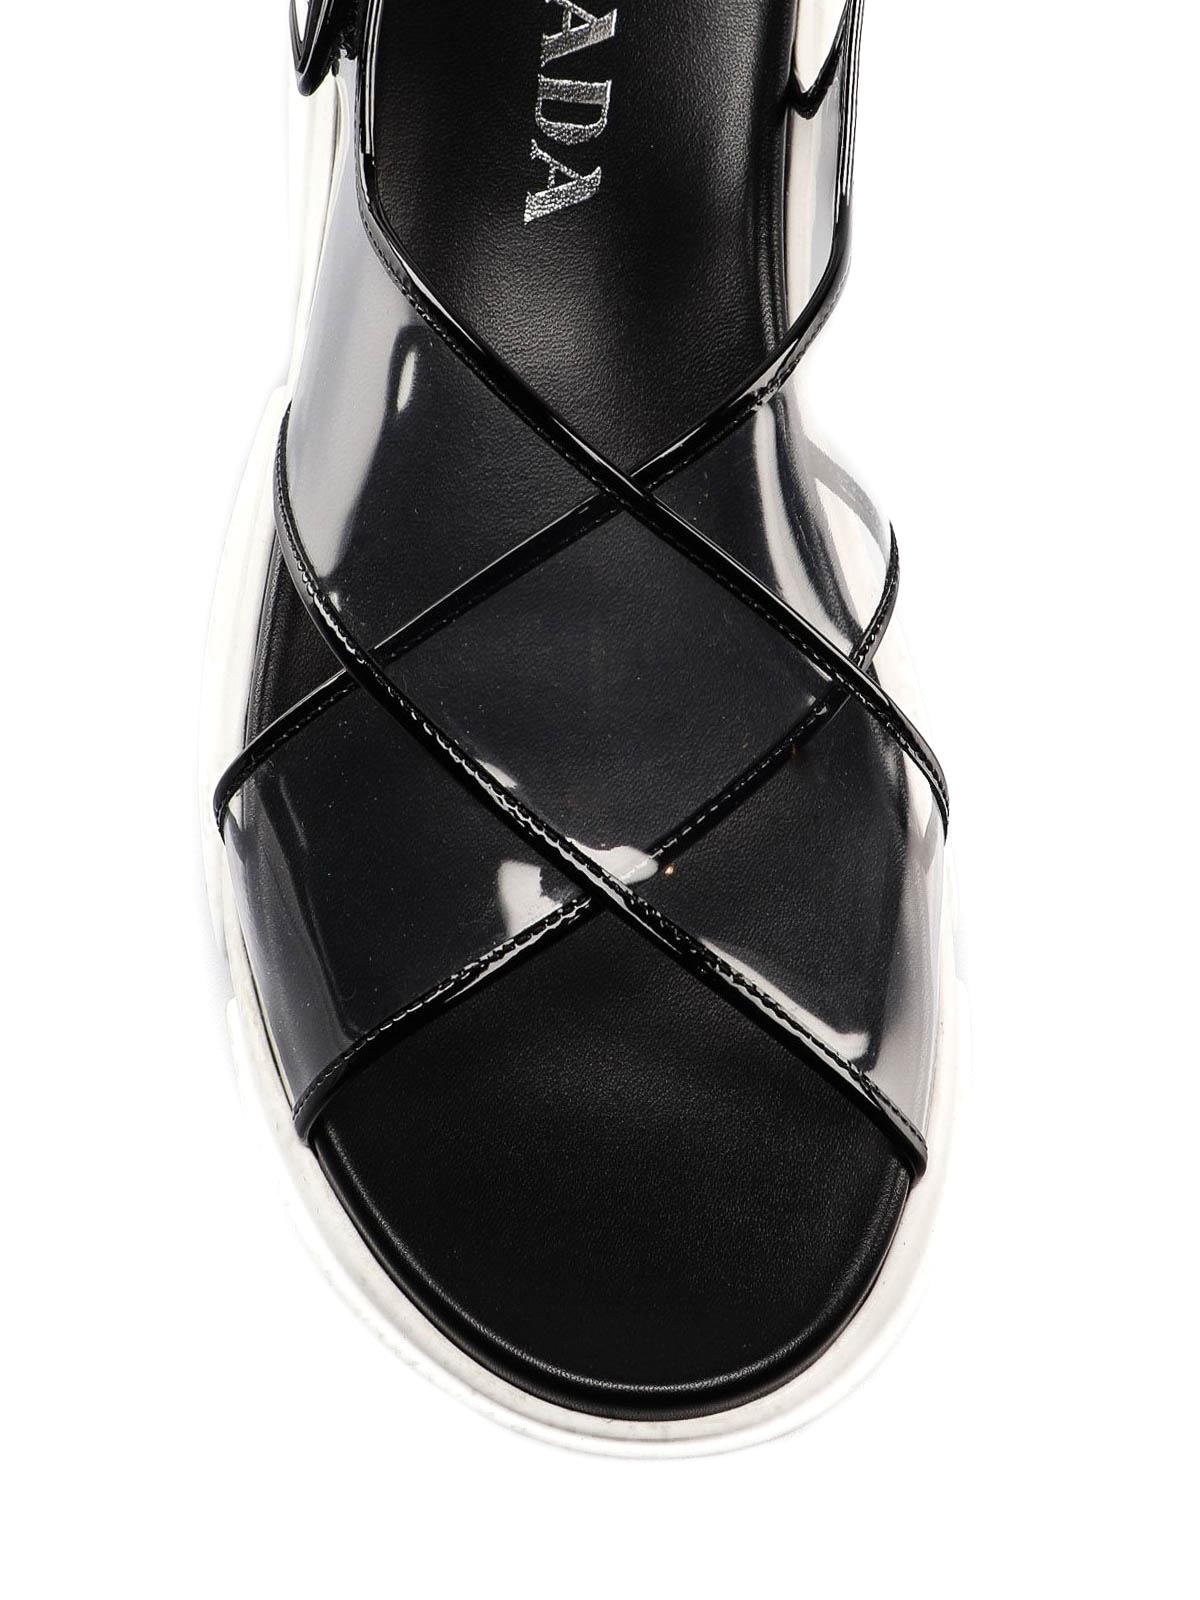 eb8f85bba Prada - Transparent criss cross sandals - sandals - 1X470L3AAUUH5